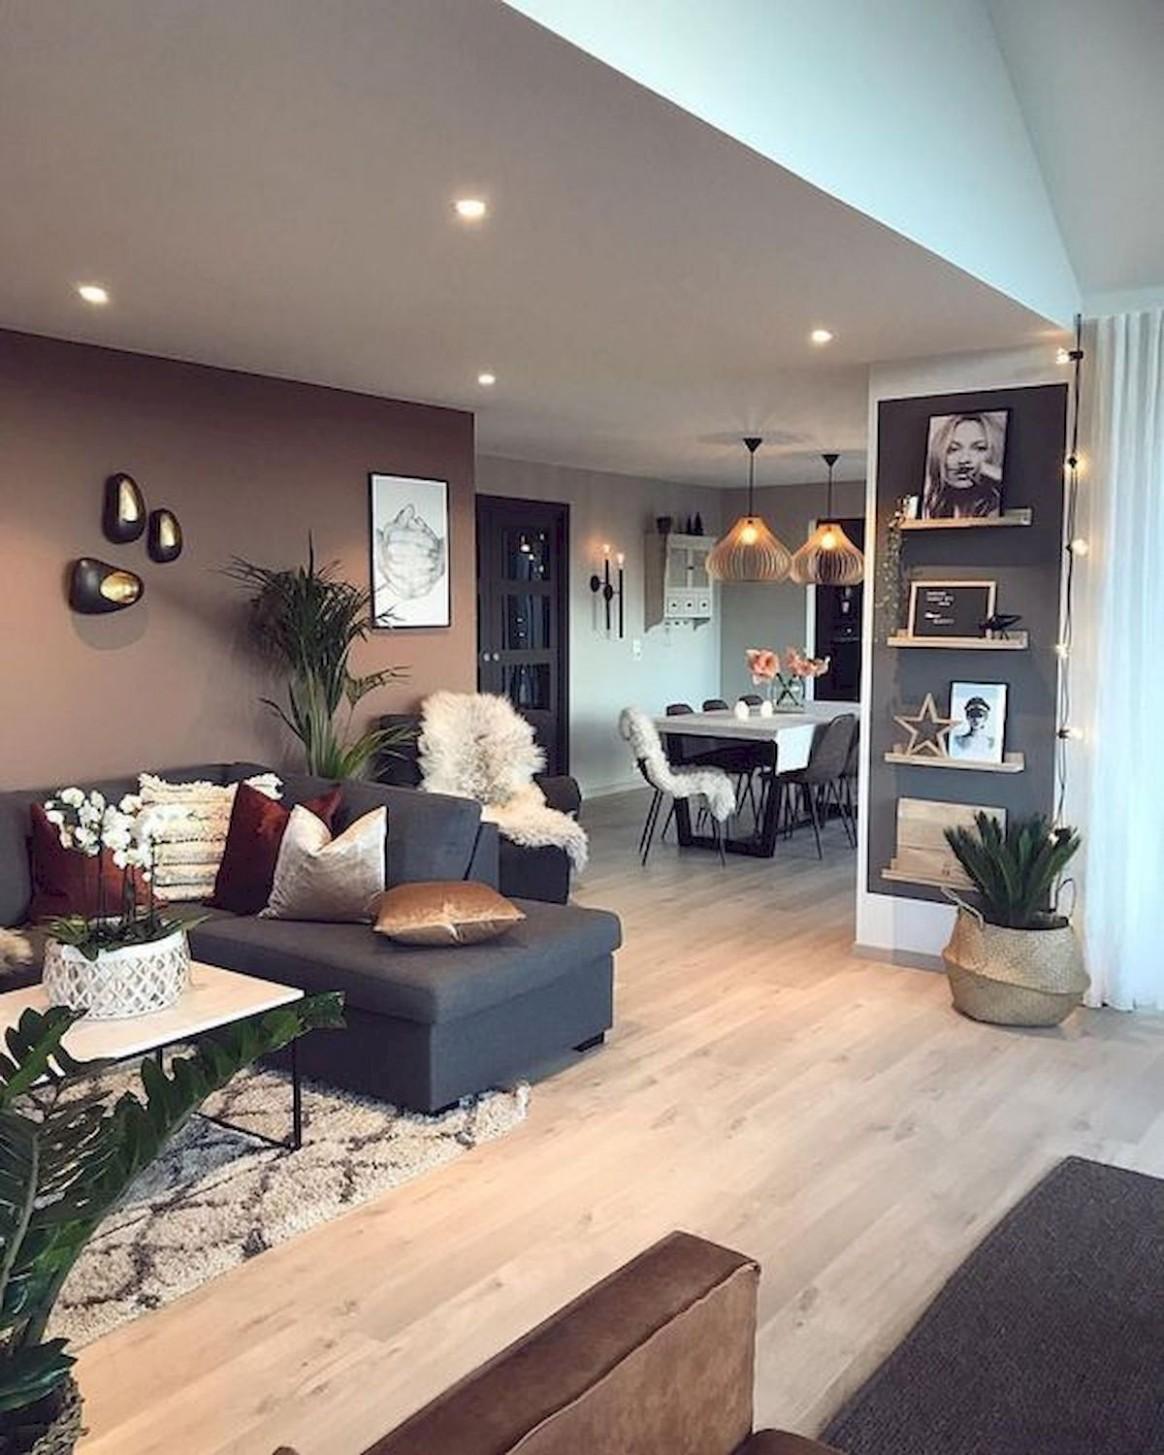 Pin by Carol-Ann Neal on Modern decor in 10  Farm house living  - Rustic Apartment Decor Ideas